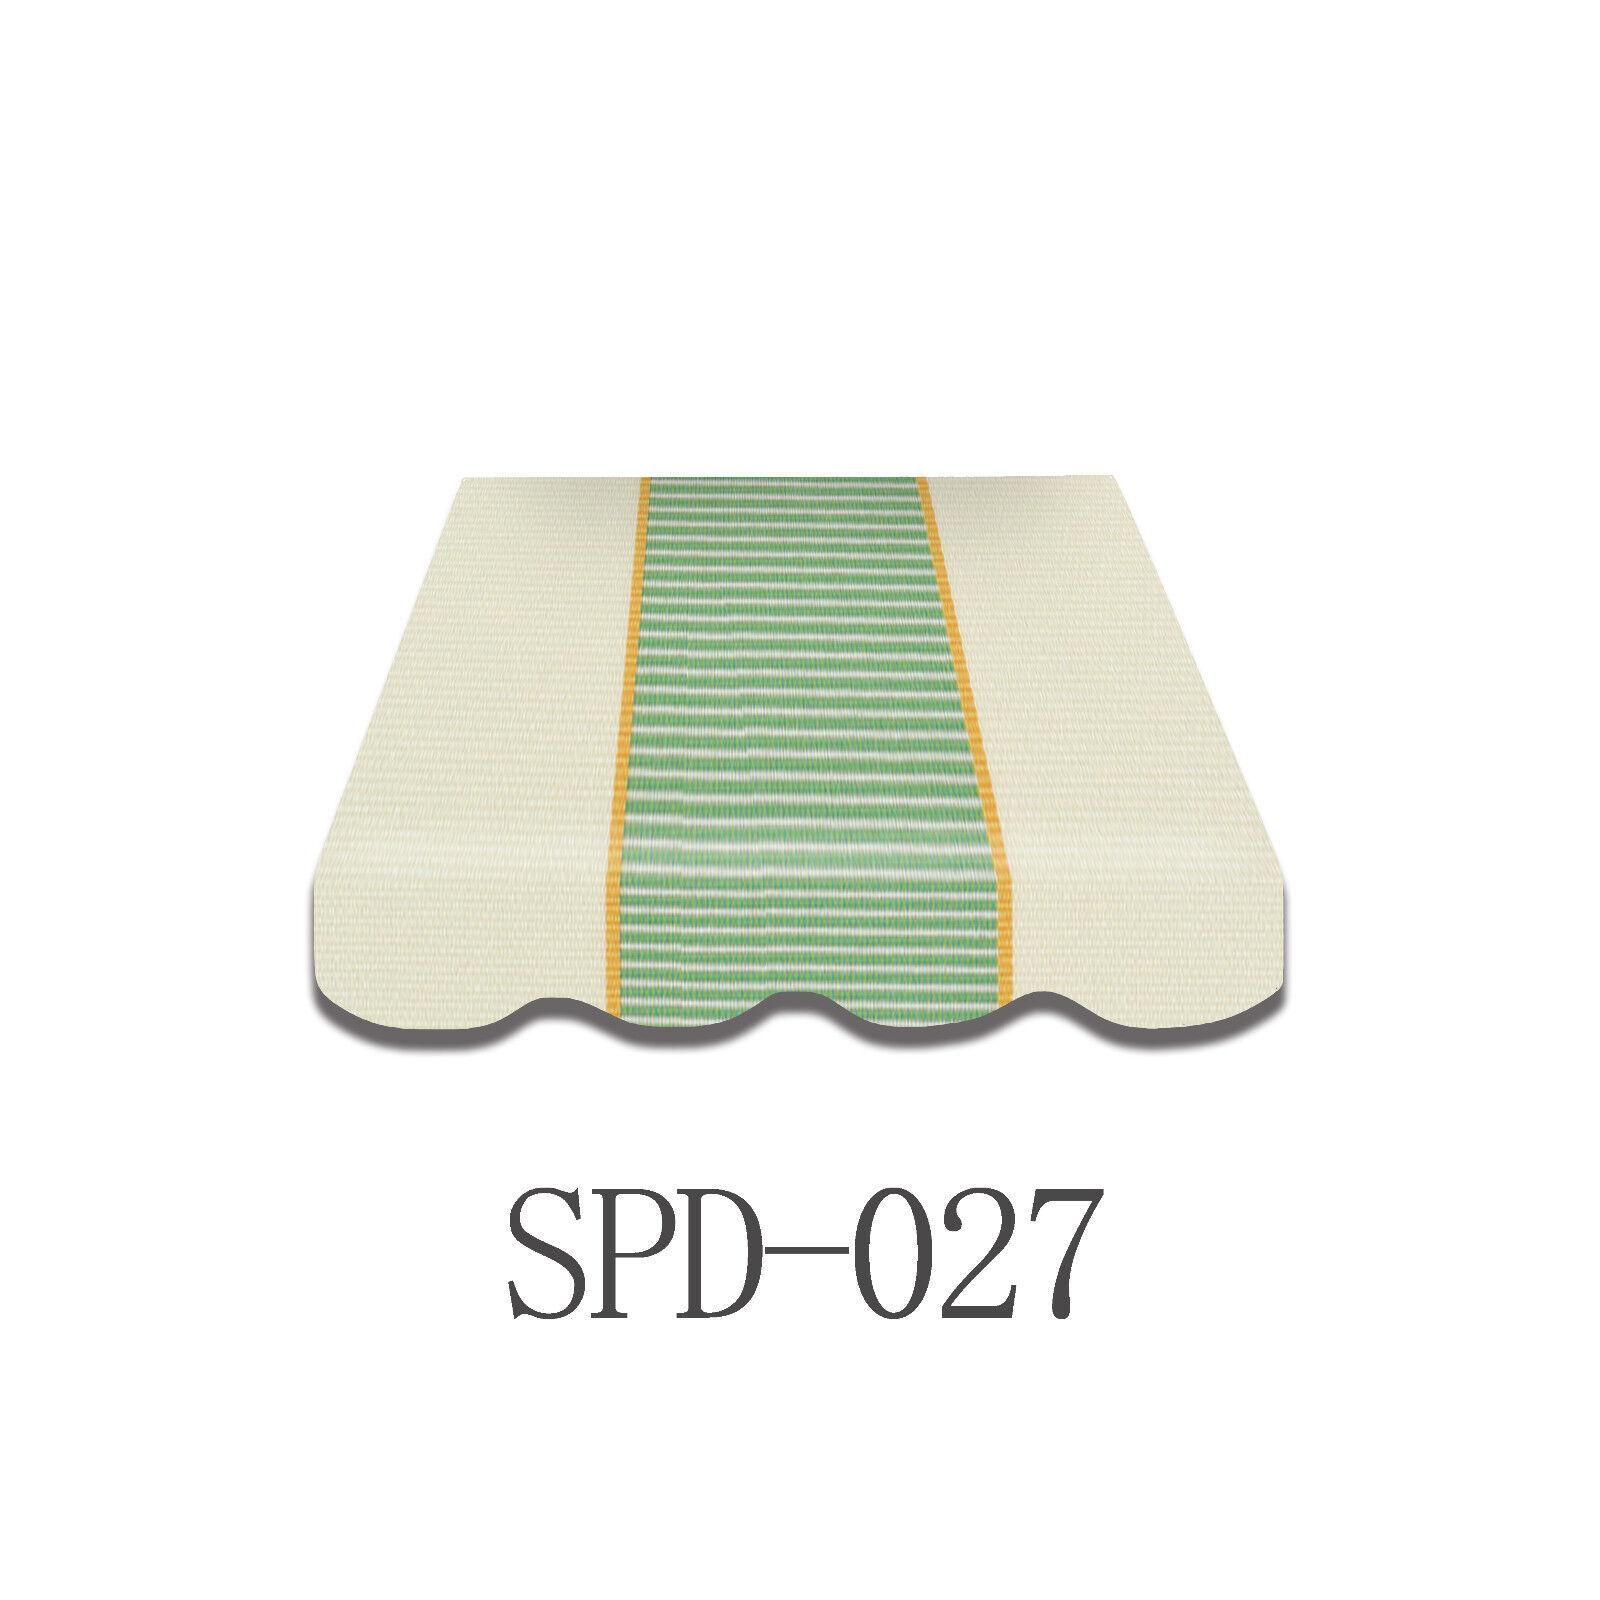 Markise Tuch Markisenbespannung inkl. Volant 3 3 3 x 2 m  Fertig genäht SPD-027 wow 8e6f76